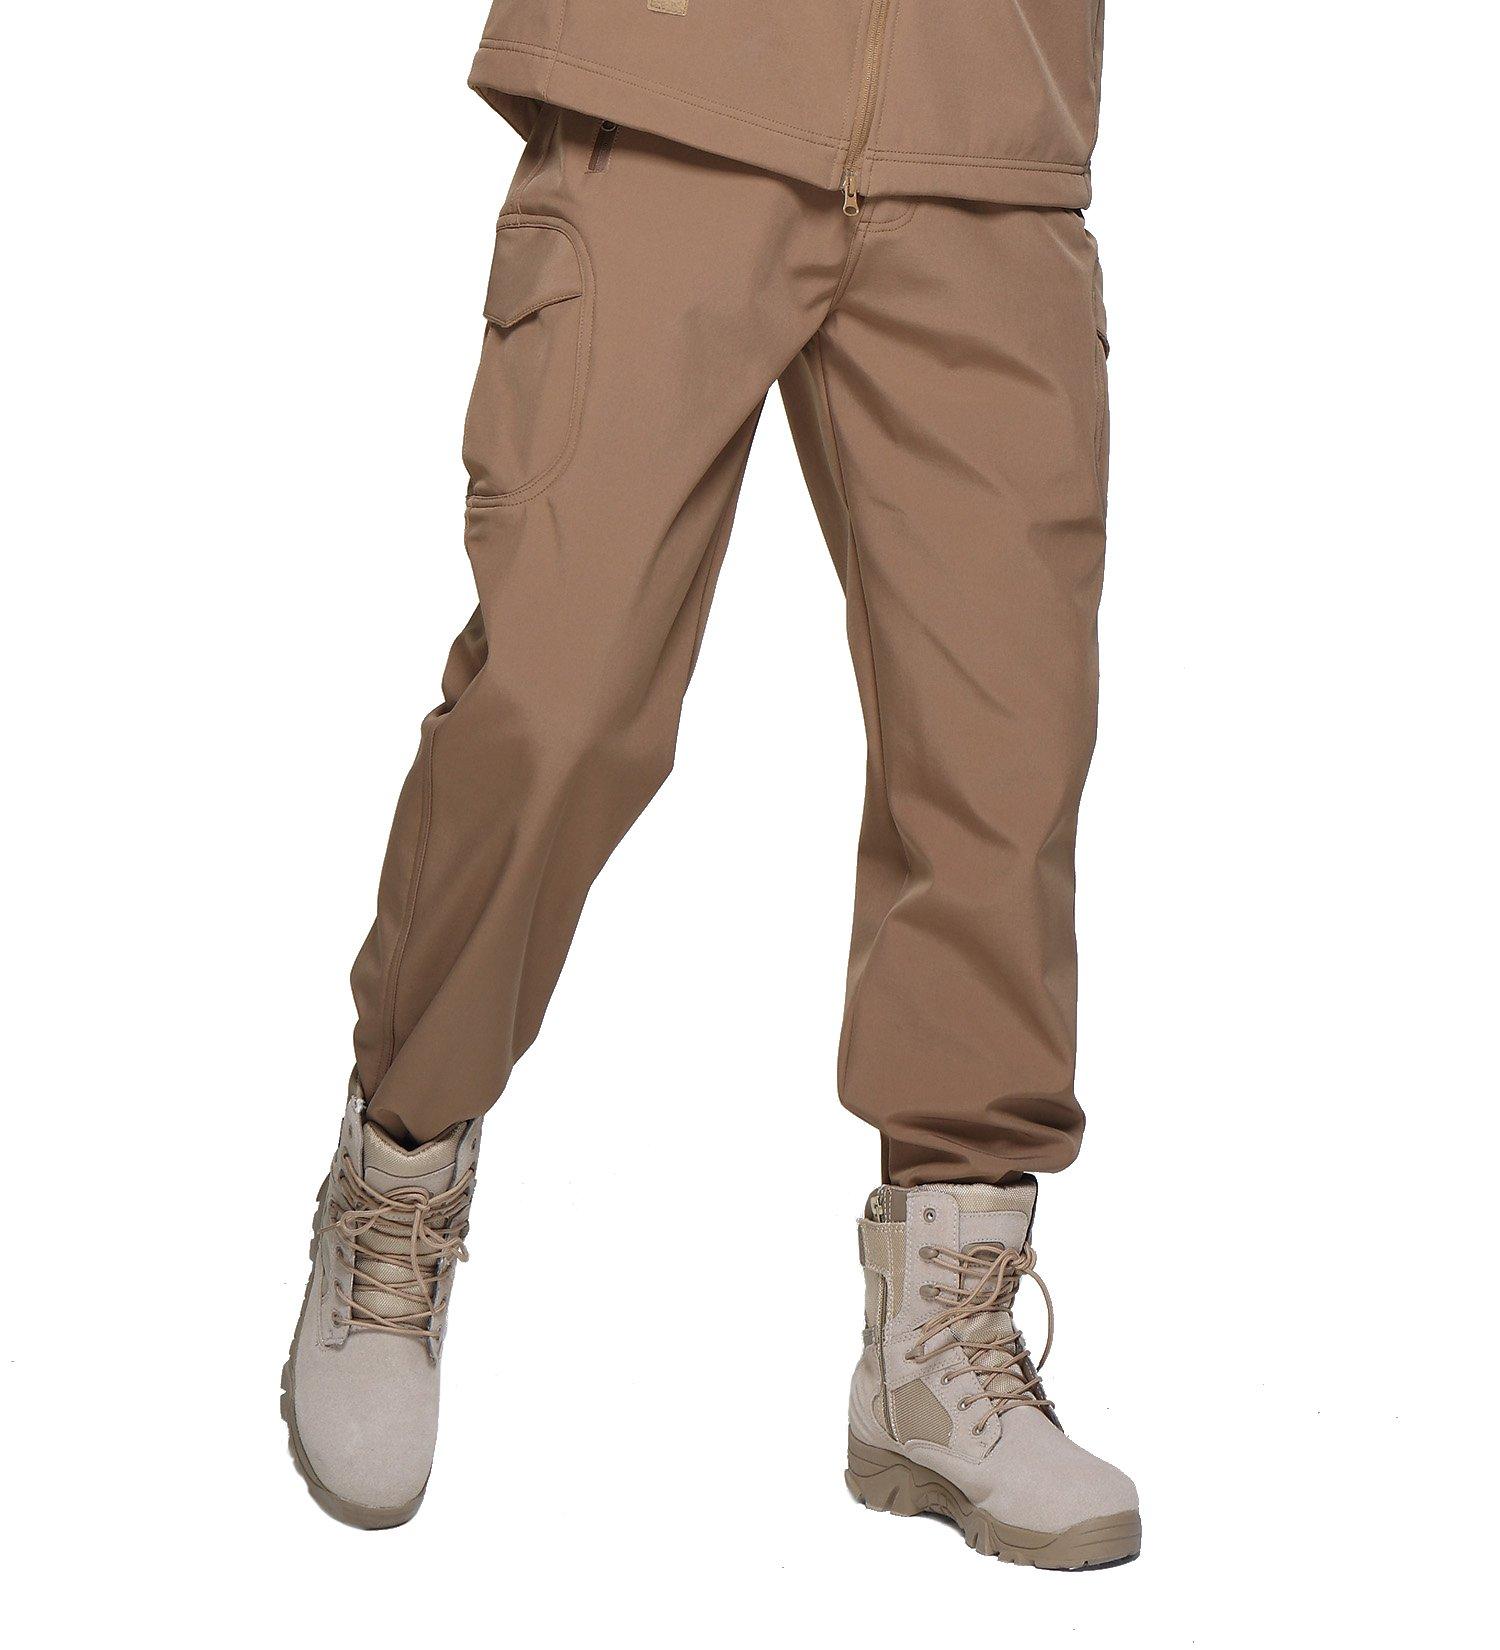 MAGCOMSEN Mens Winter Snow Ski Pants Water Resistant Zipper Pockets Softshell Fleece Lined Hiking Pants Rain Pants